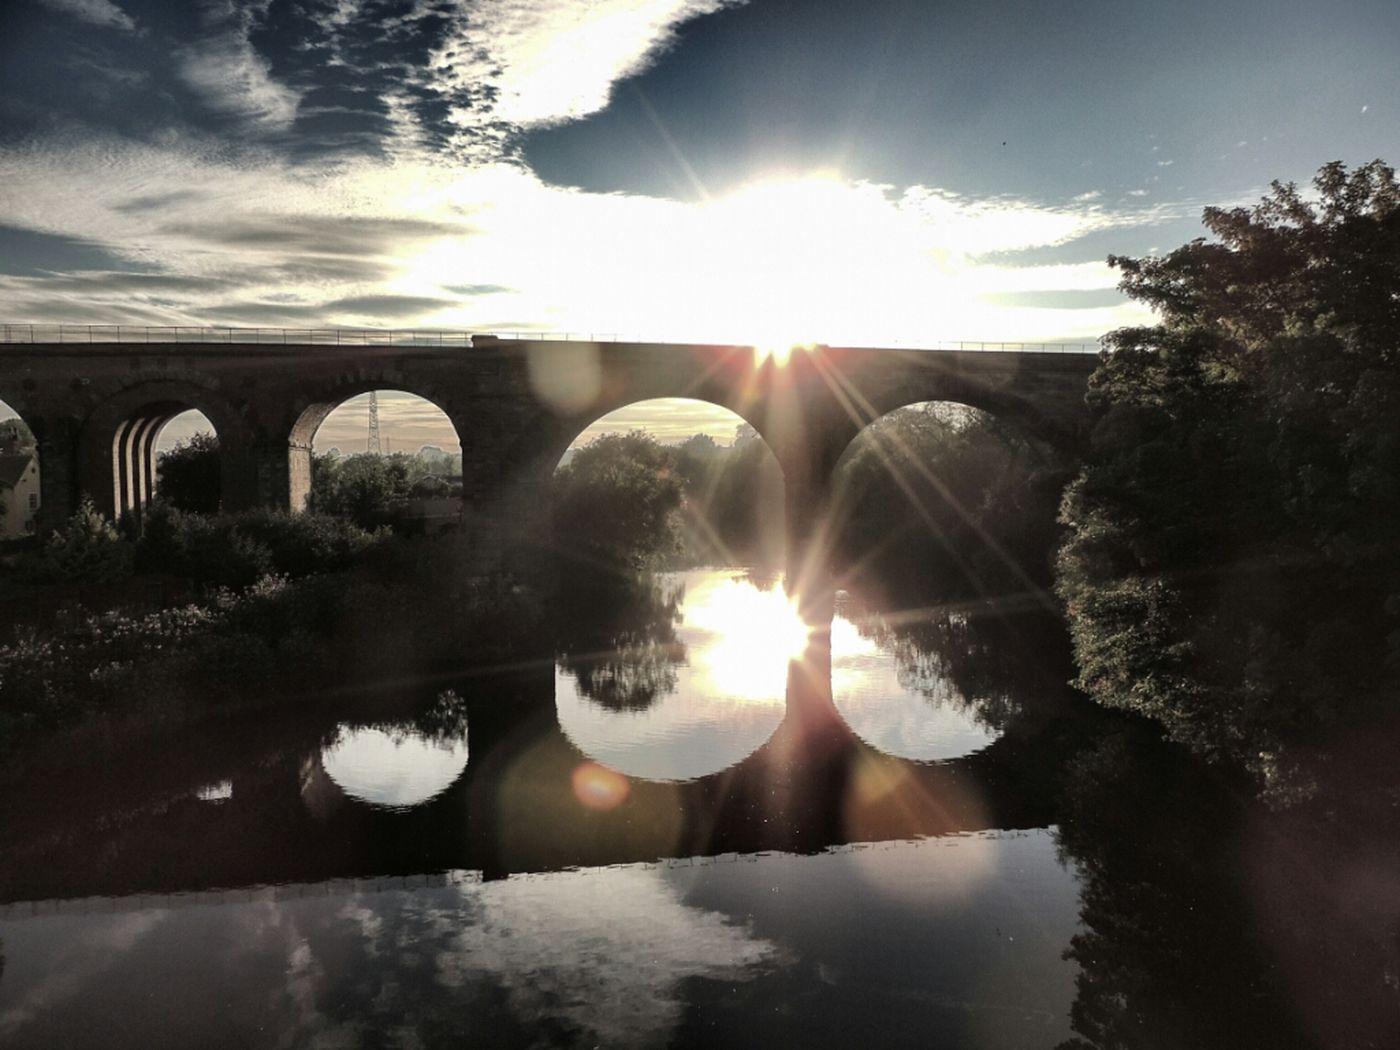 Sunset Sunshine Taking Photos Water_collection